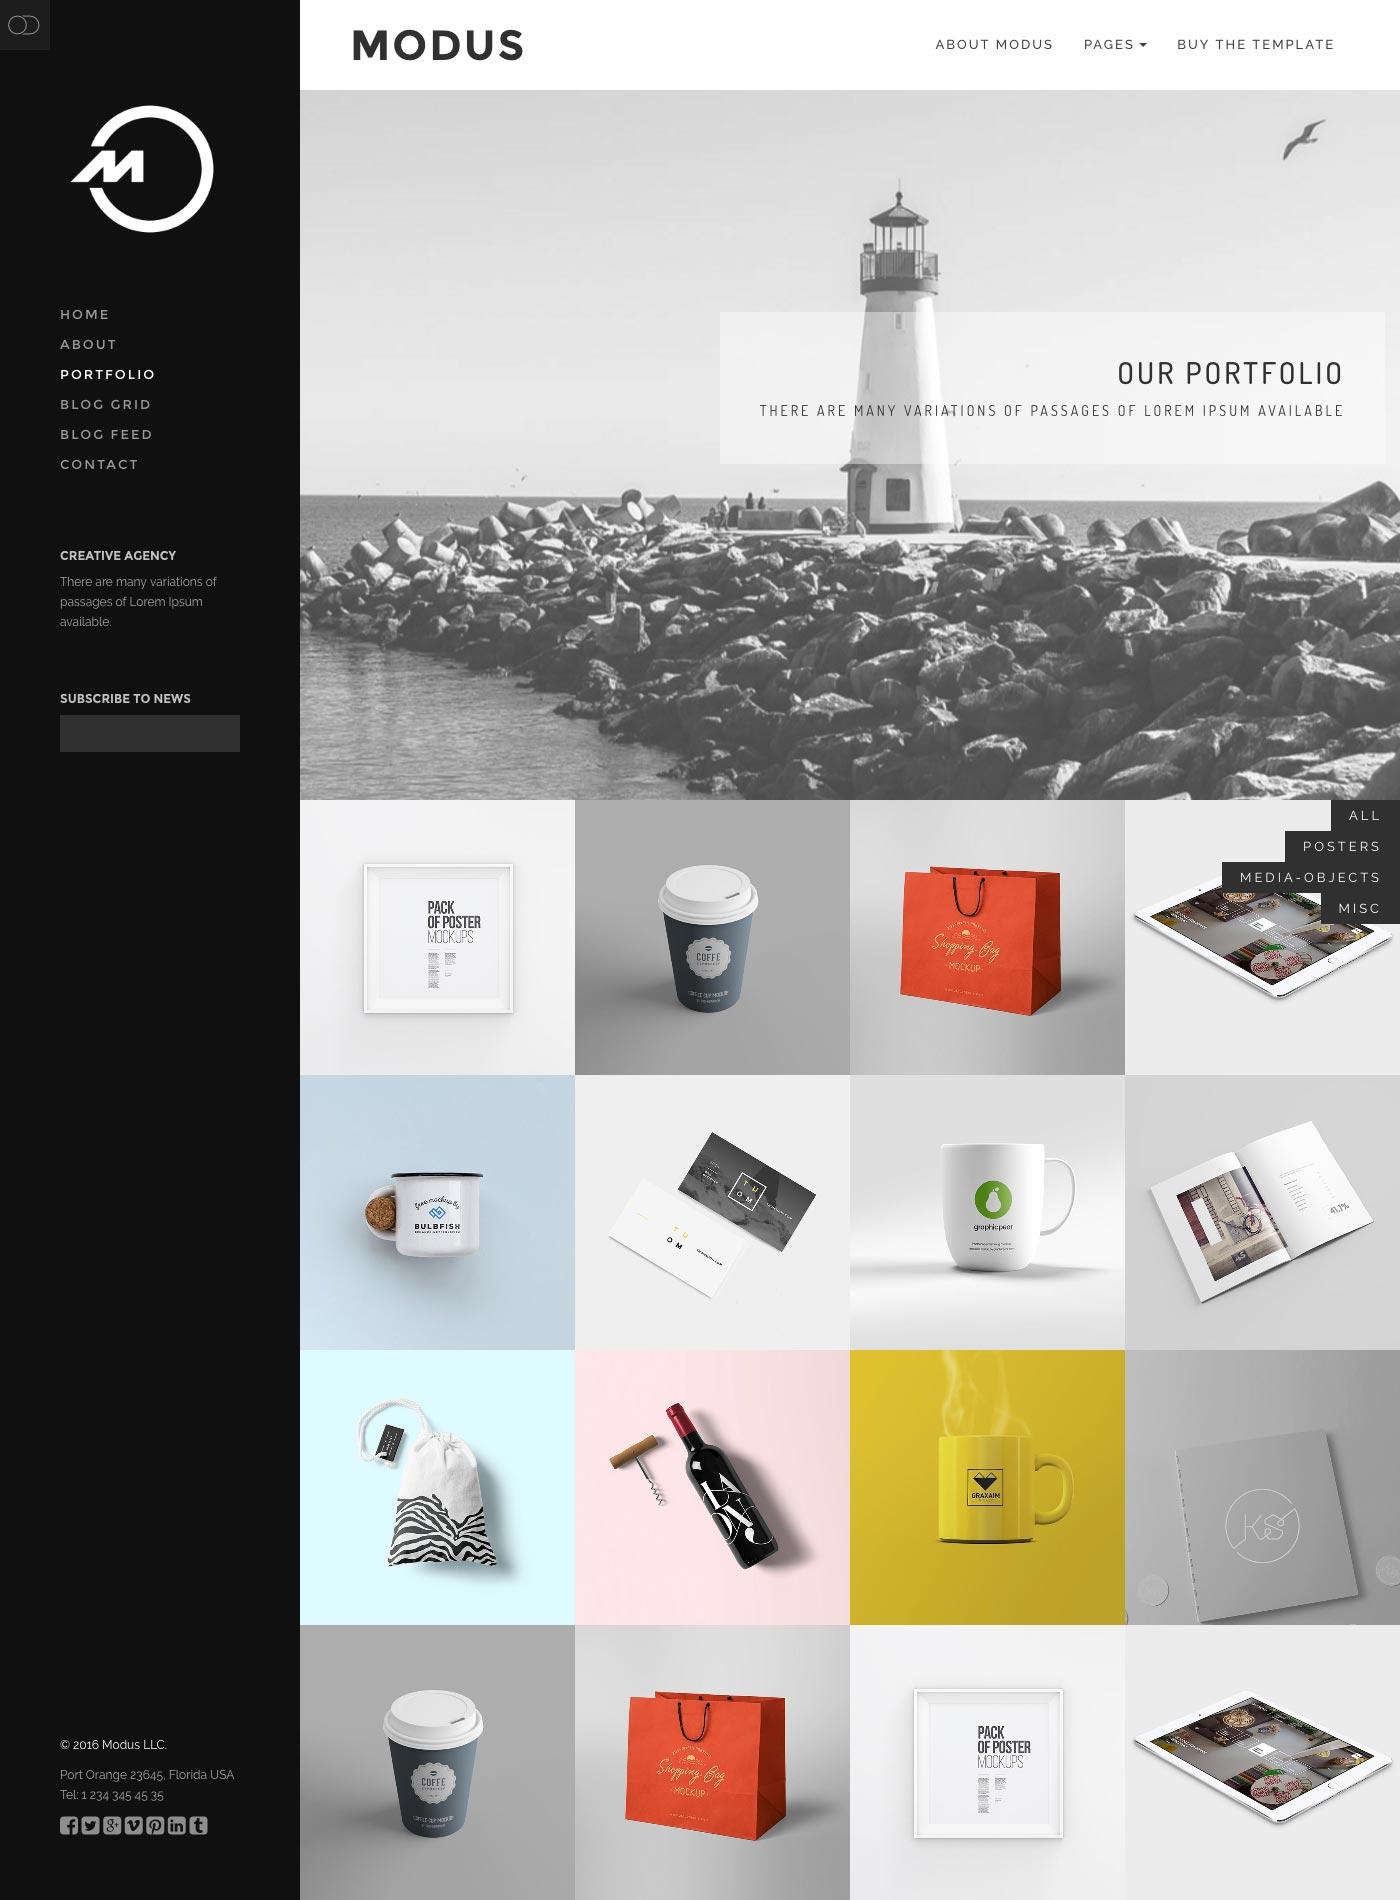 Modus - Agency Portfolio HTML by neuethemes | ThemeForest